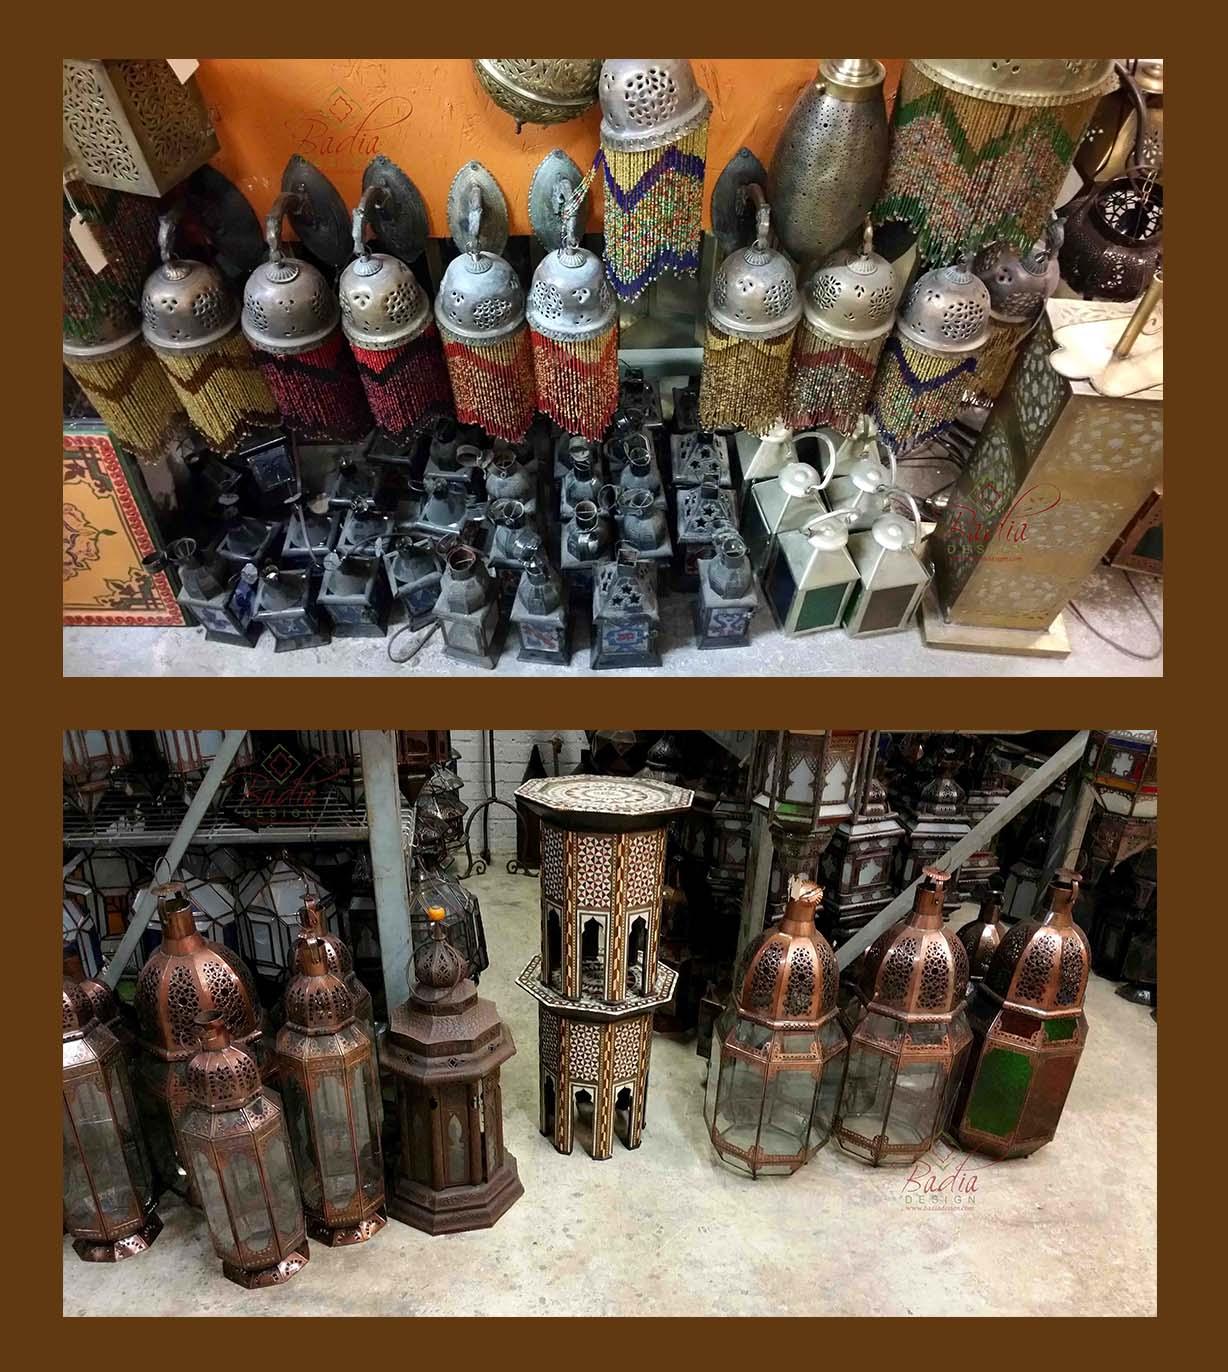 Arabian nights moroccan furniture los angeles for Arabian decoration materials